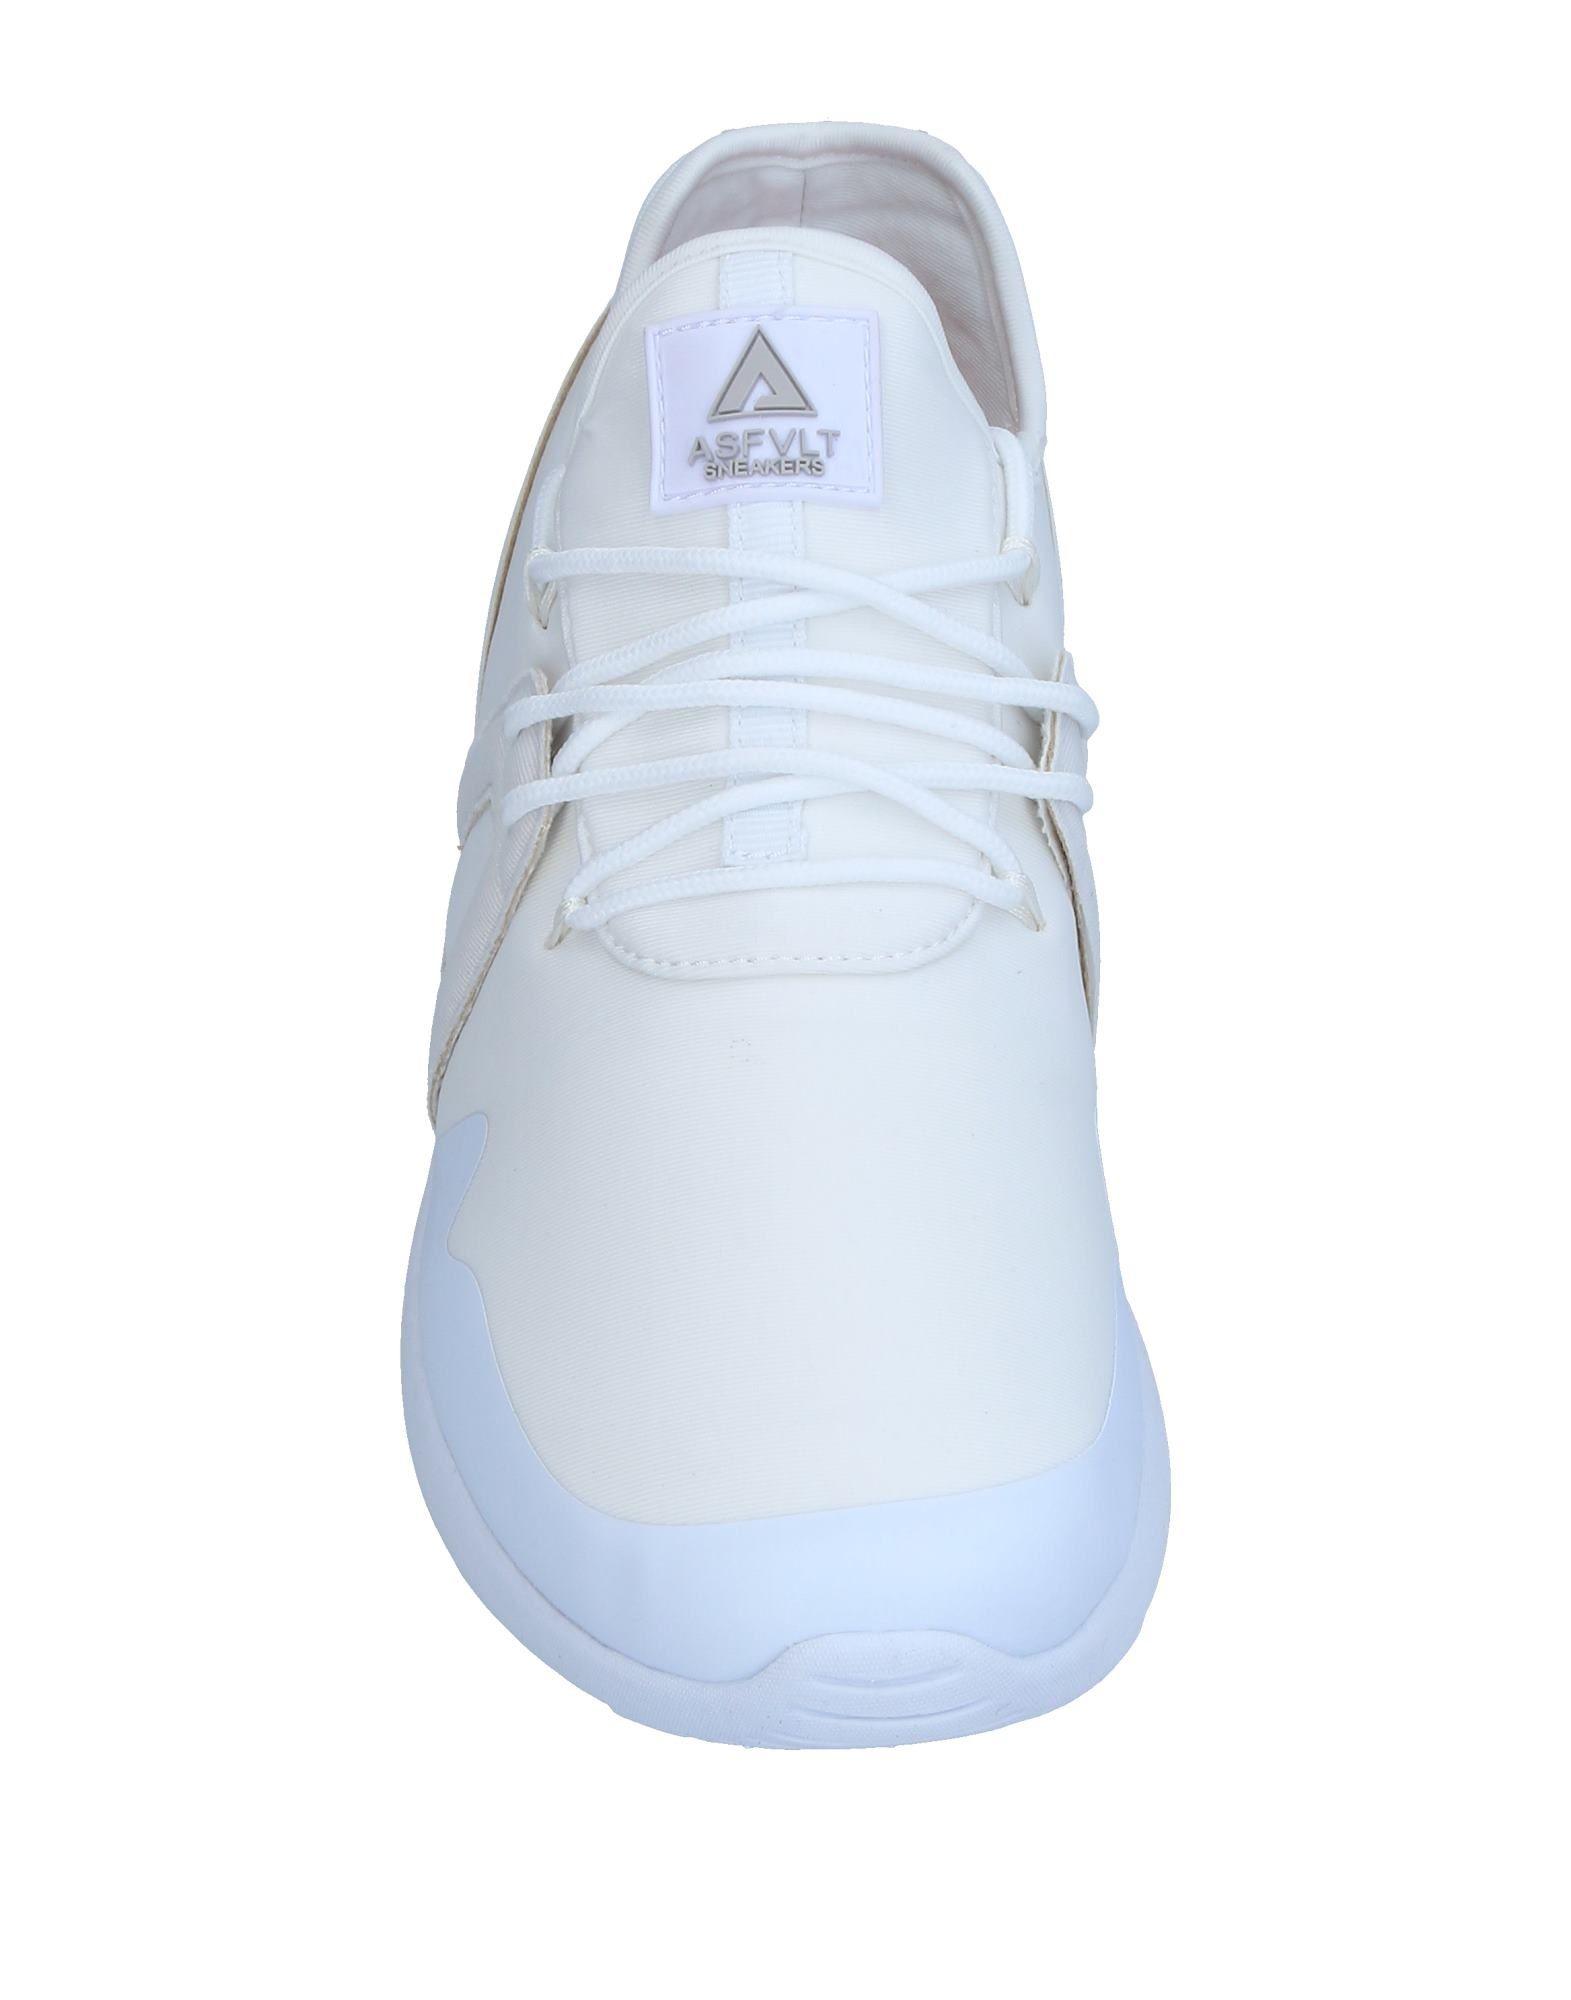 Asfvlt Sneakers Sneakers Asfvlt Herren  11340002WI 4010e6